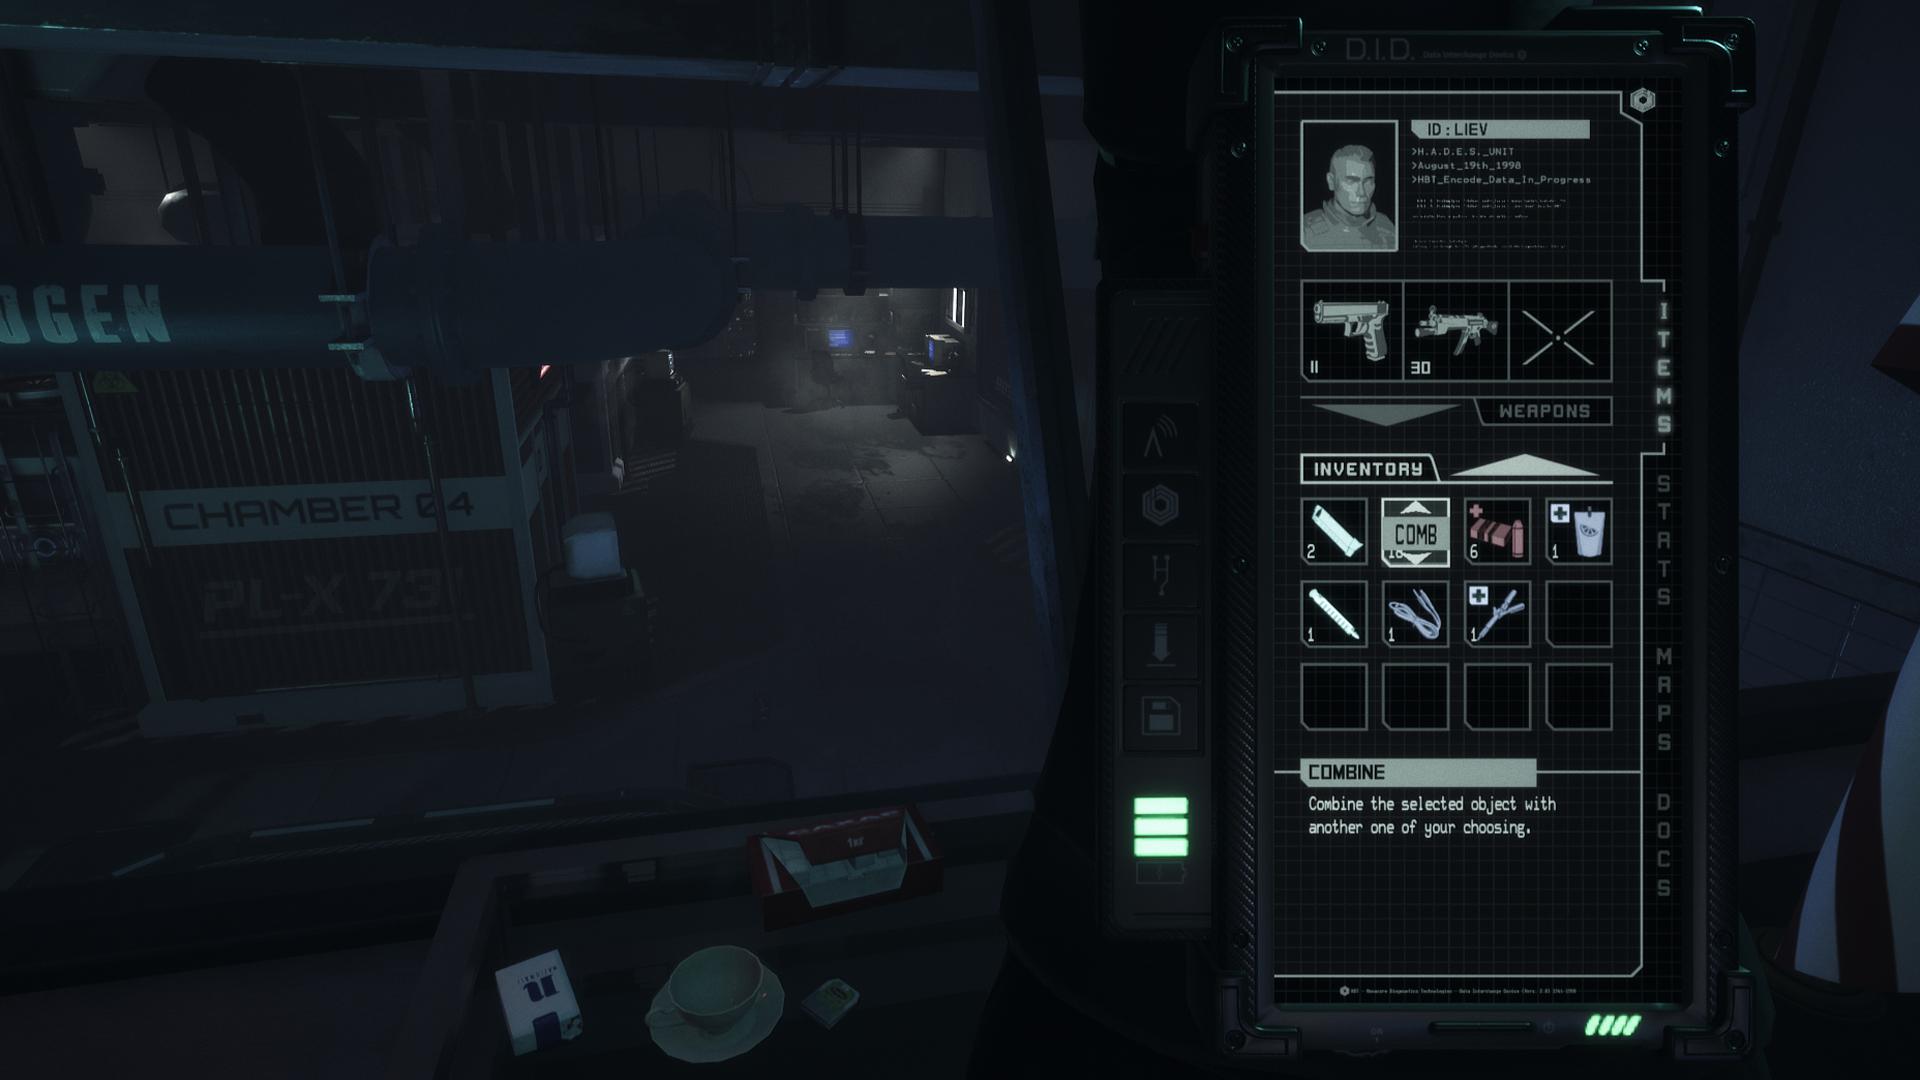 Daymare_1998_Screenshot_10